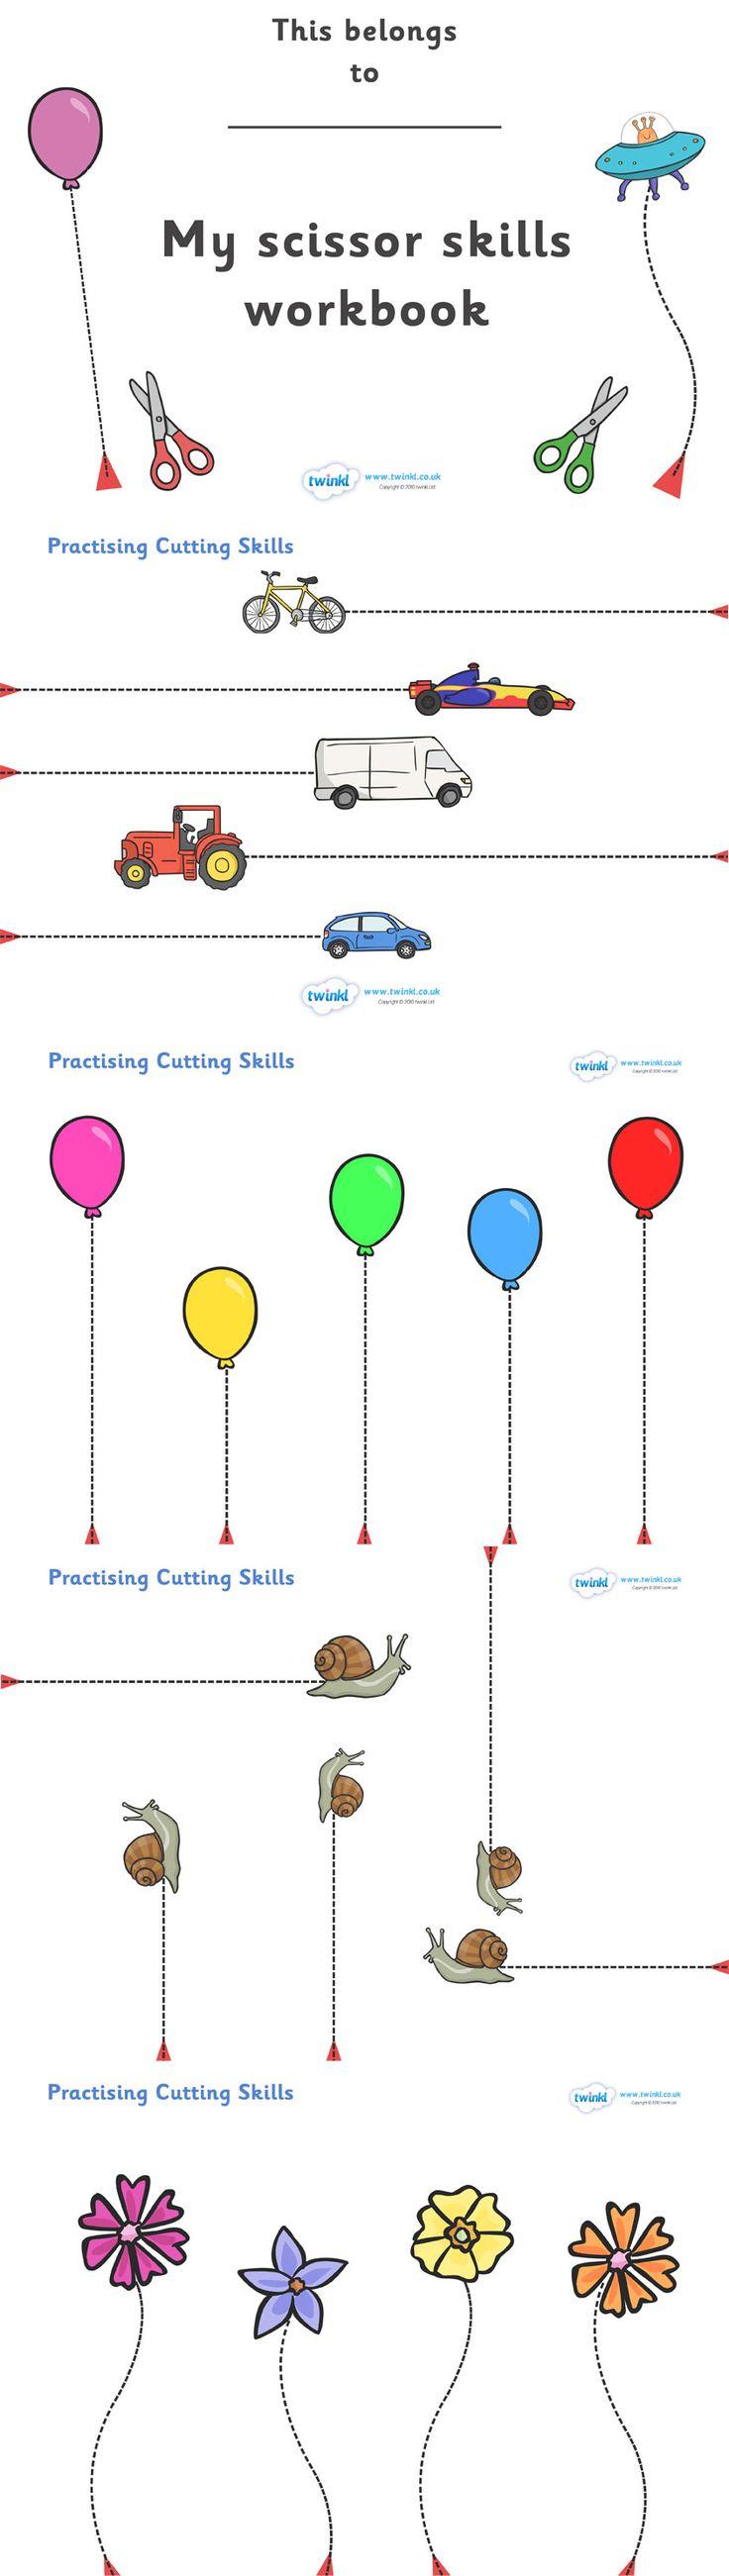 Twinkl Resources >> Scissor Cutting Skills Booklet  >> Classroom printables for Pre-School, Kindergarten, Elementary School and beyond! Scissor Control, Work books, Crafts